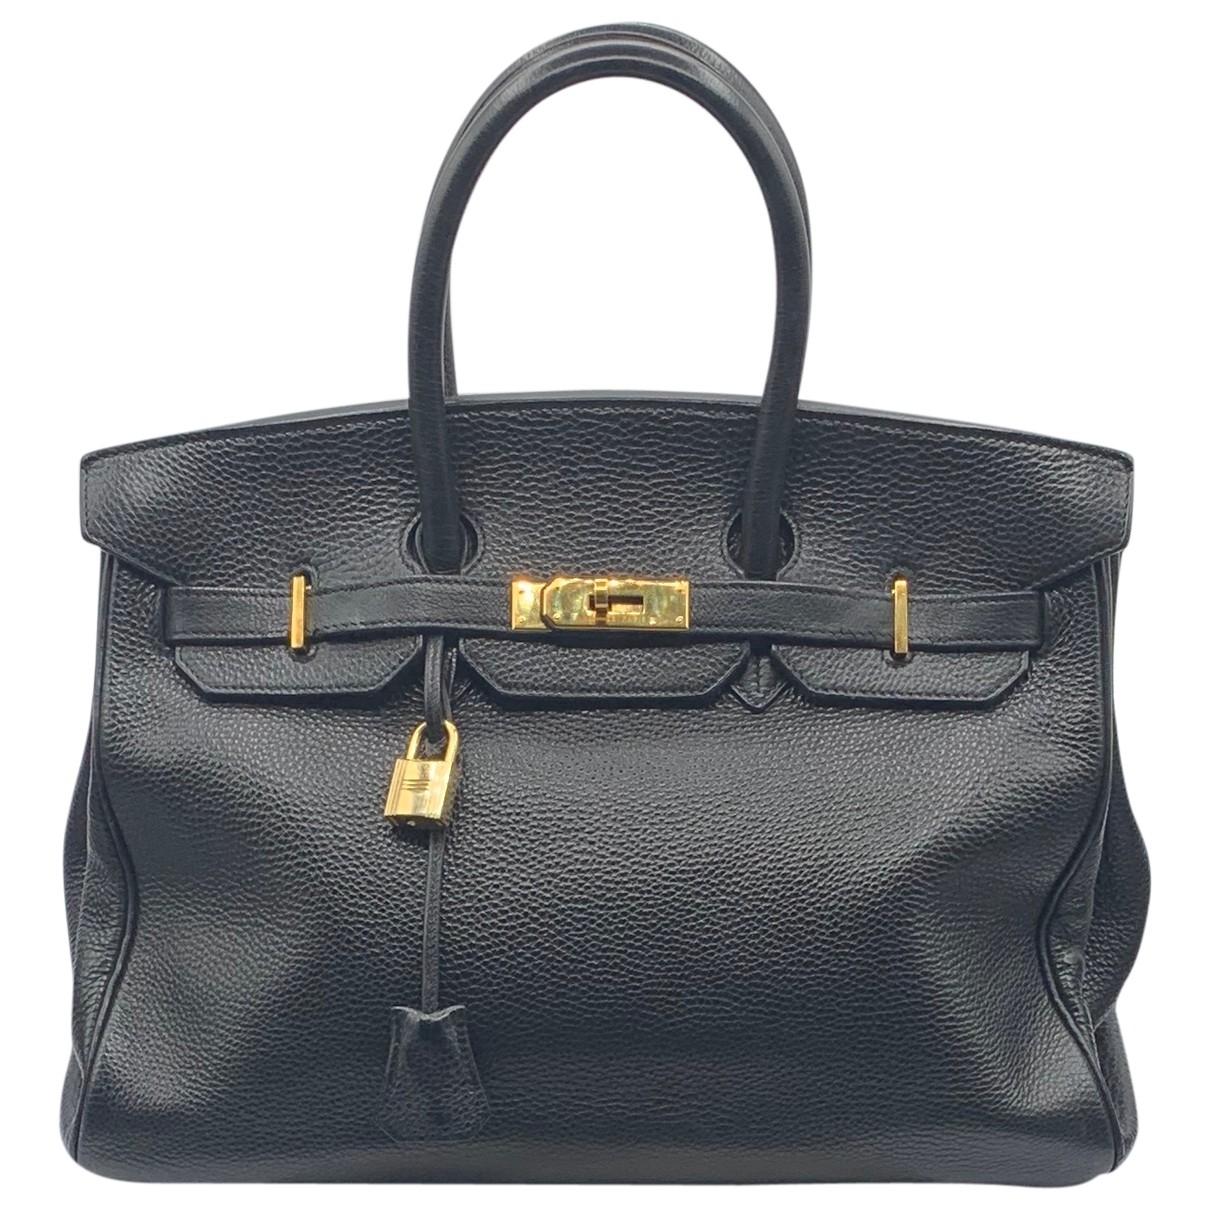 Hermes Birkin 35 Handtasche in  Schwarz Leder